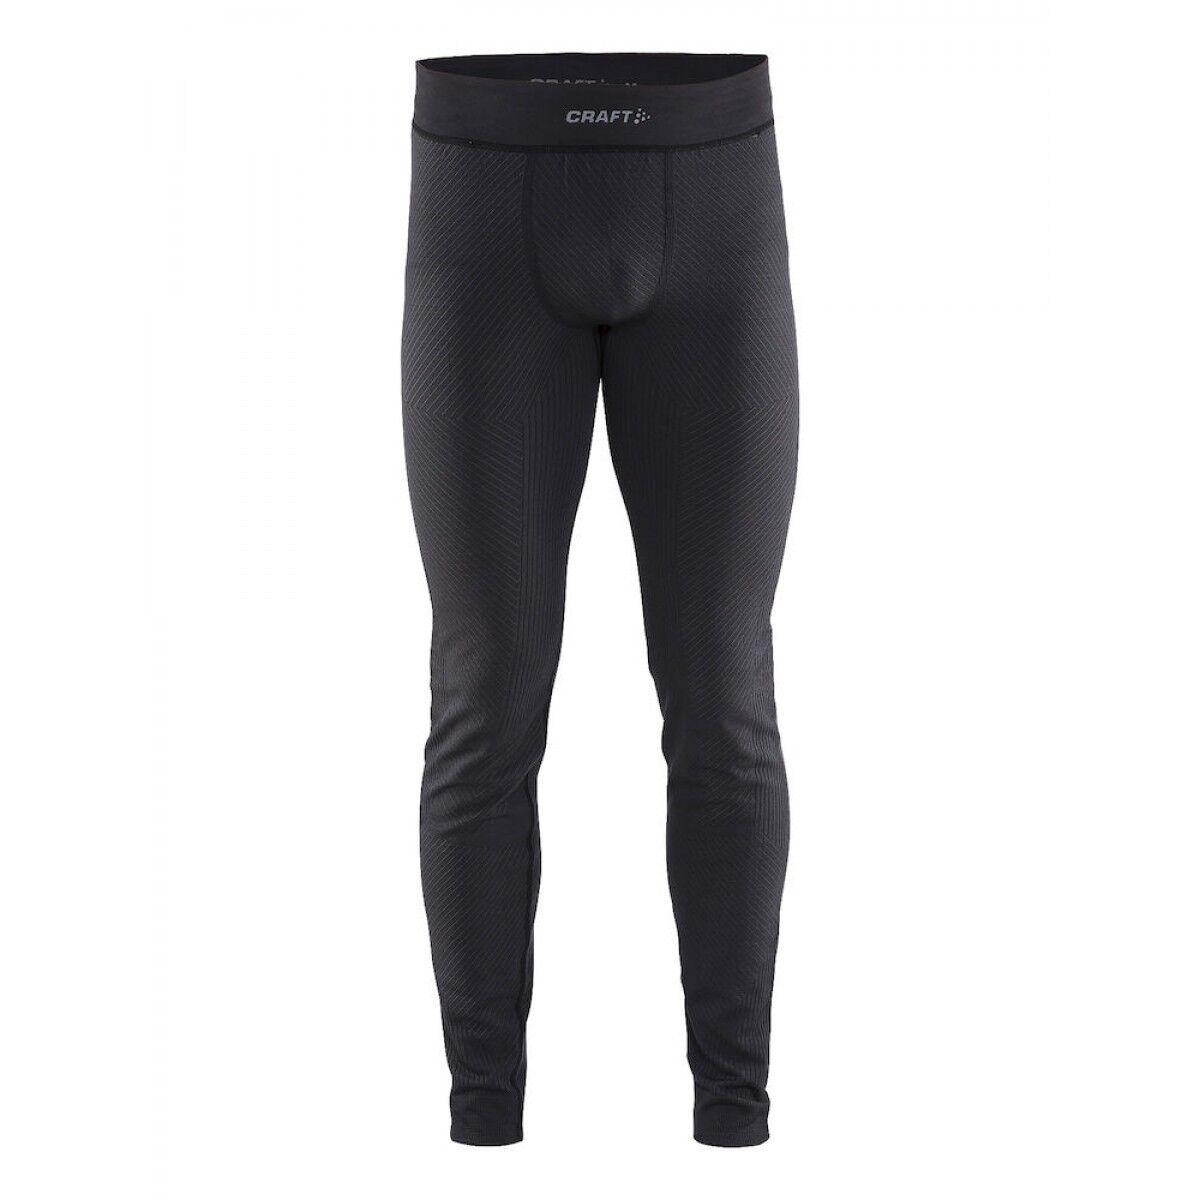 Craft Men's Wool Comfort Baselayer Pants - 2017